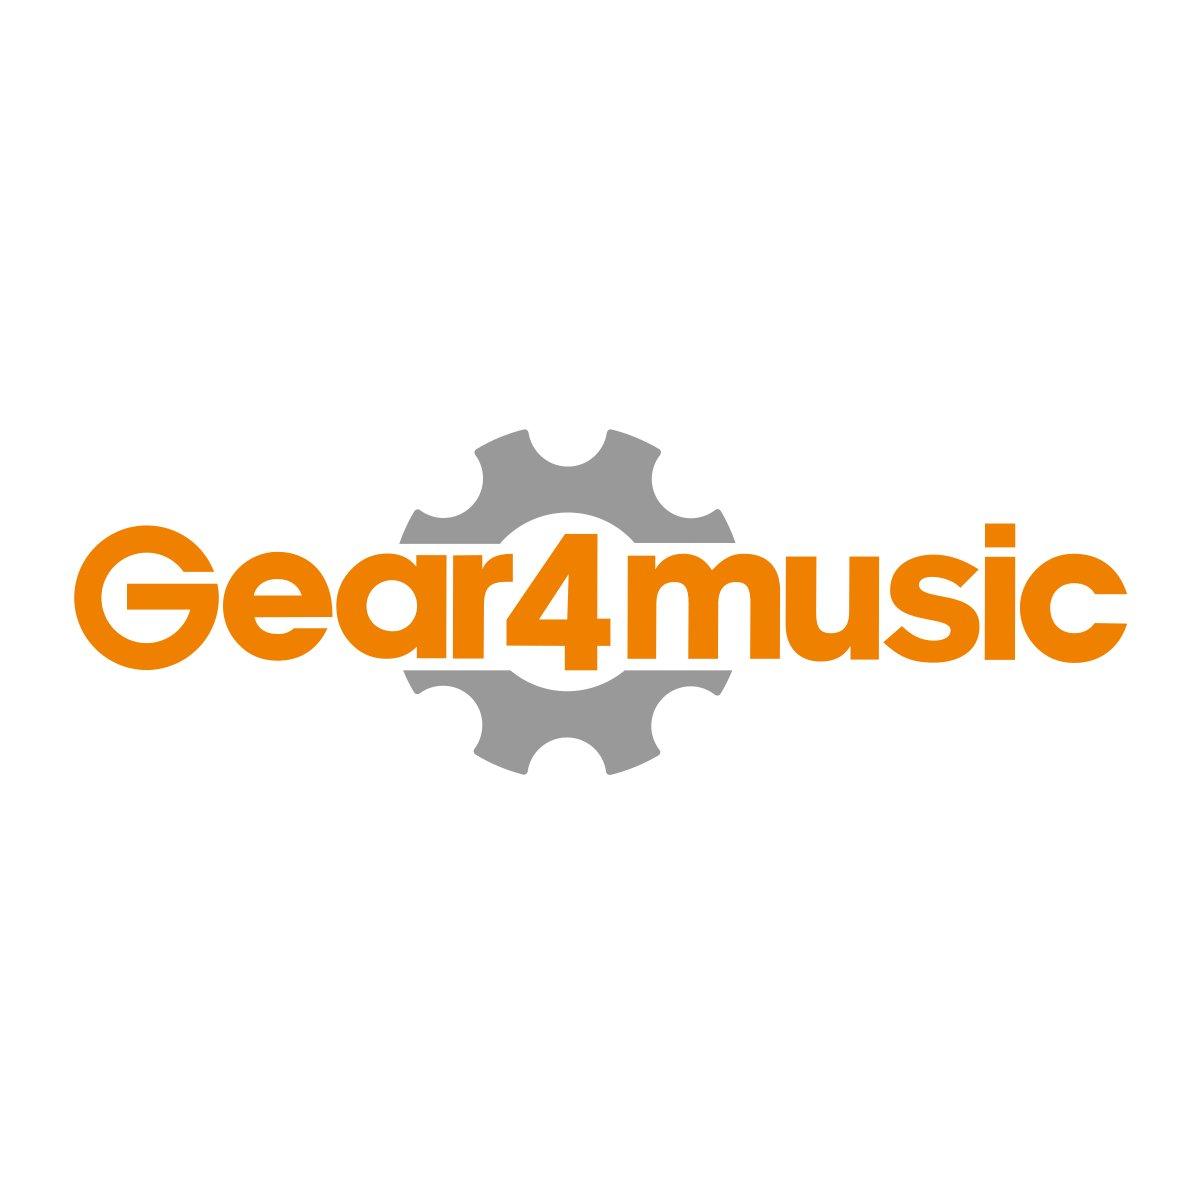 Electric Guitar Foam Case by Gear4music at Gear4music.com